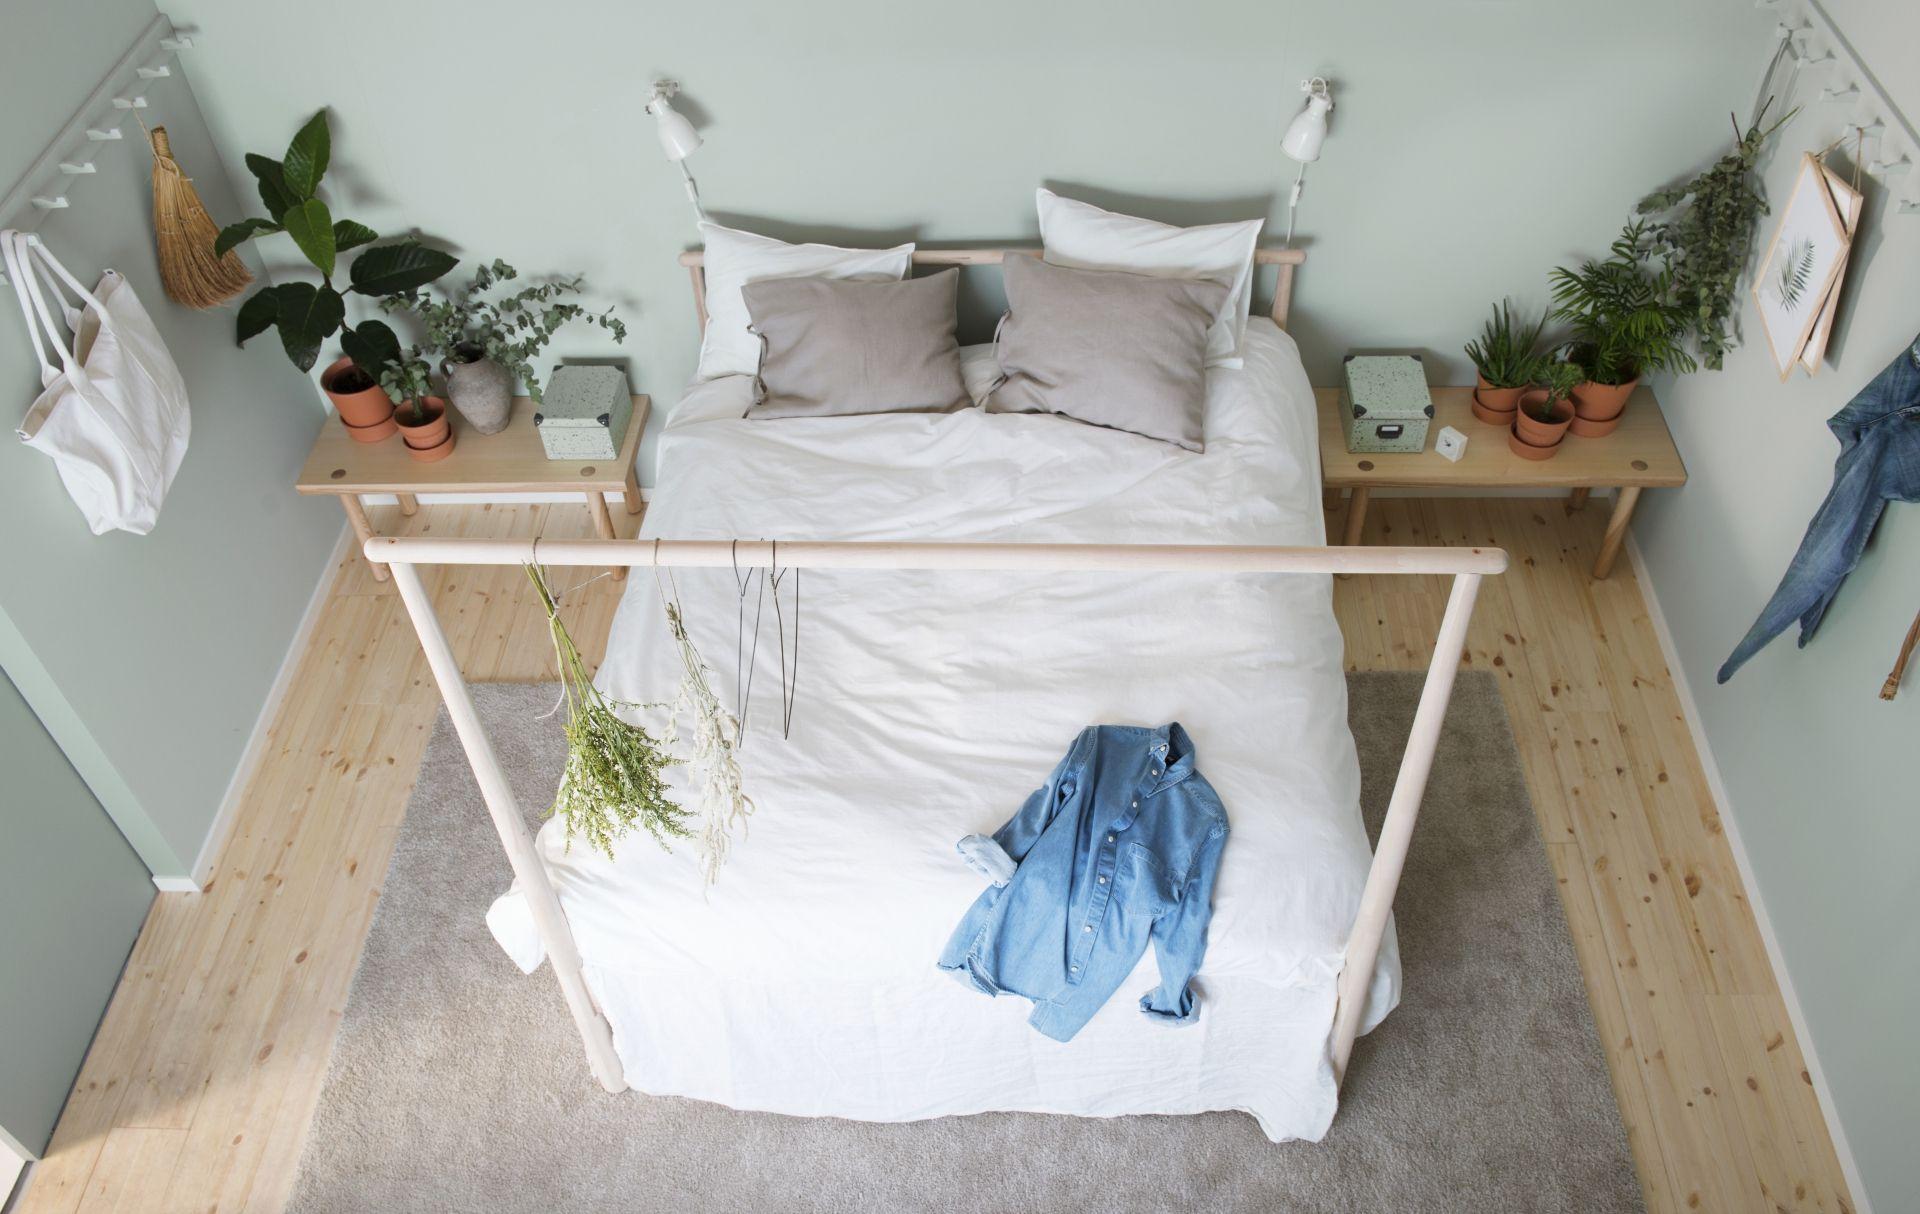 Slaapkamer Inspiratie Hout : GjÖra bedframe ikea ikeanl ikeanederland bed slaapkamer slapen